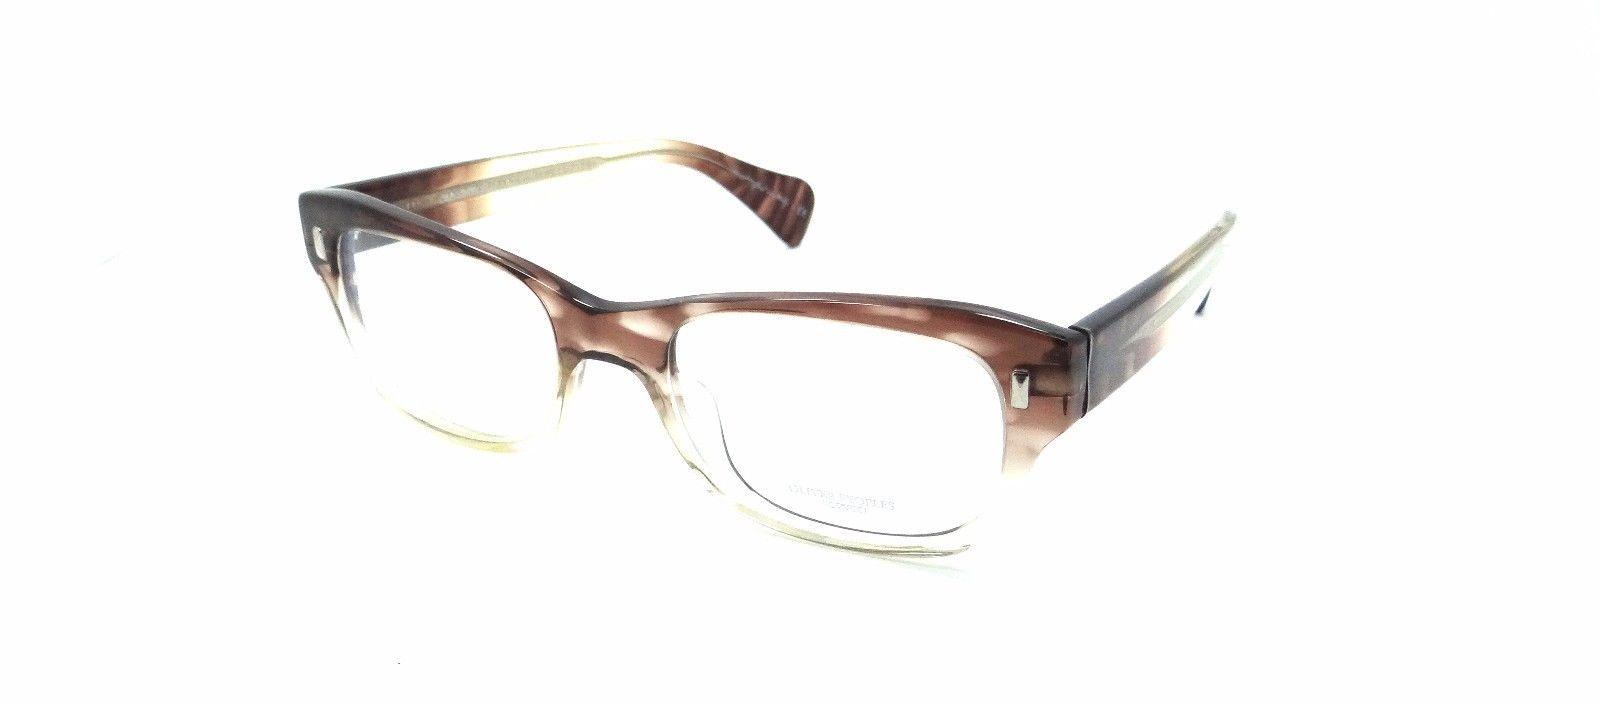 8f5c2c39446 Oliver Peoples Rx Eyeglasses Frames Wacks and 50 similar items. 57